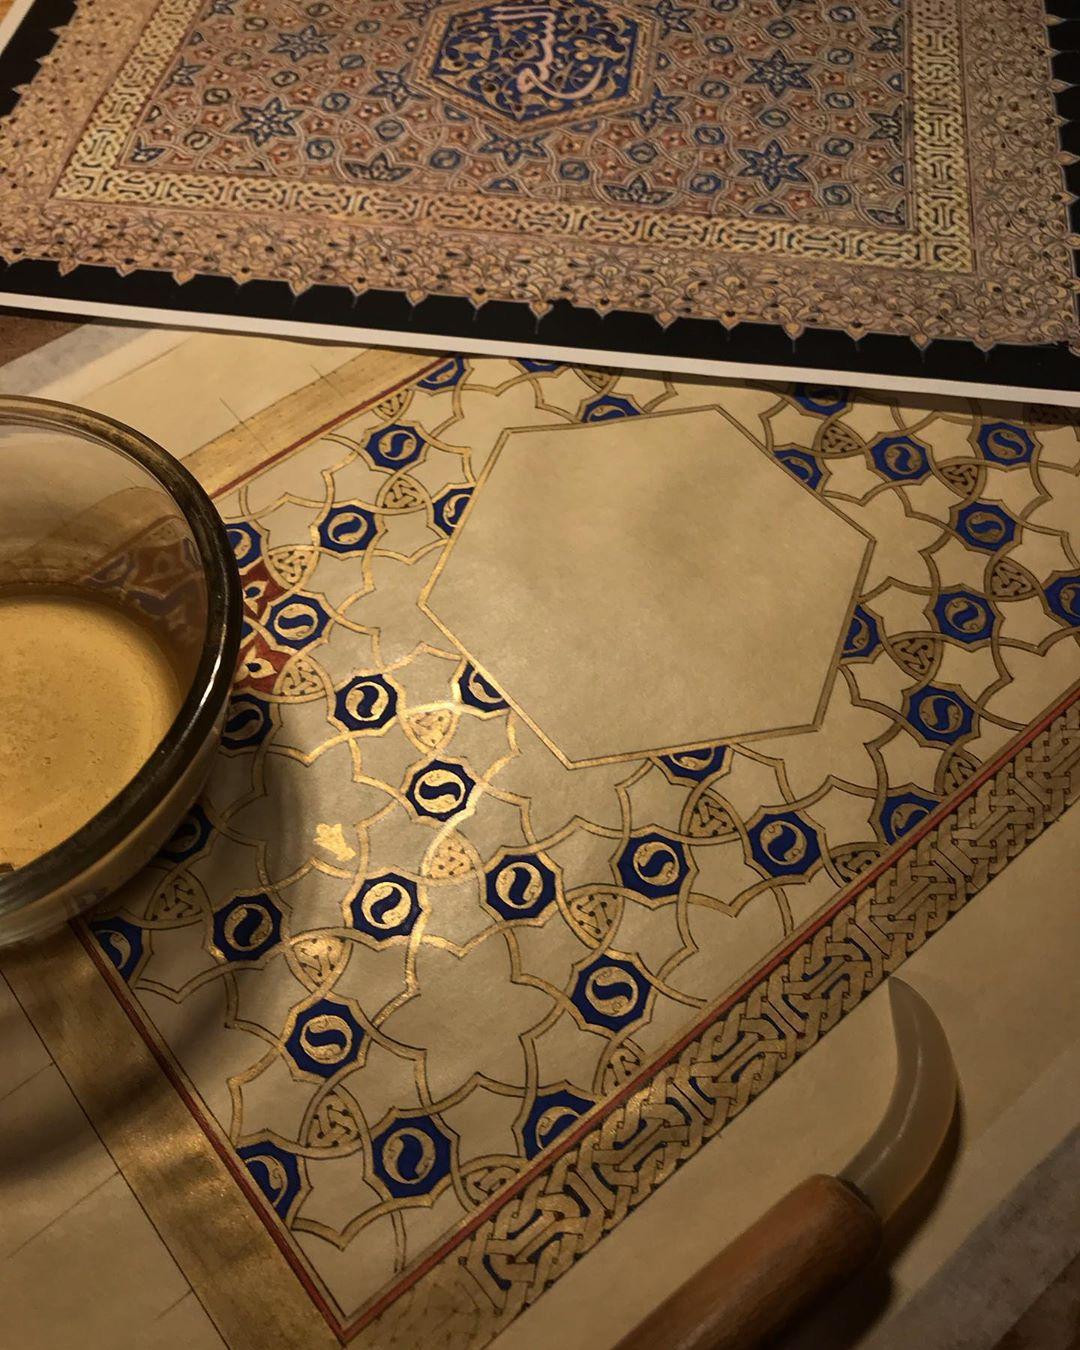 Karya Kaligrafi  نه دامیست نه زنجیر همه بسته چراییم چه بندست چه زنجیر که برپاست خدایا مولانا . گ…- Ne Javaher